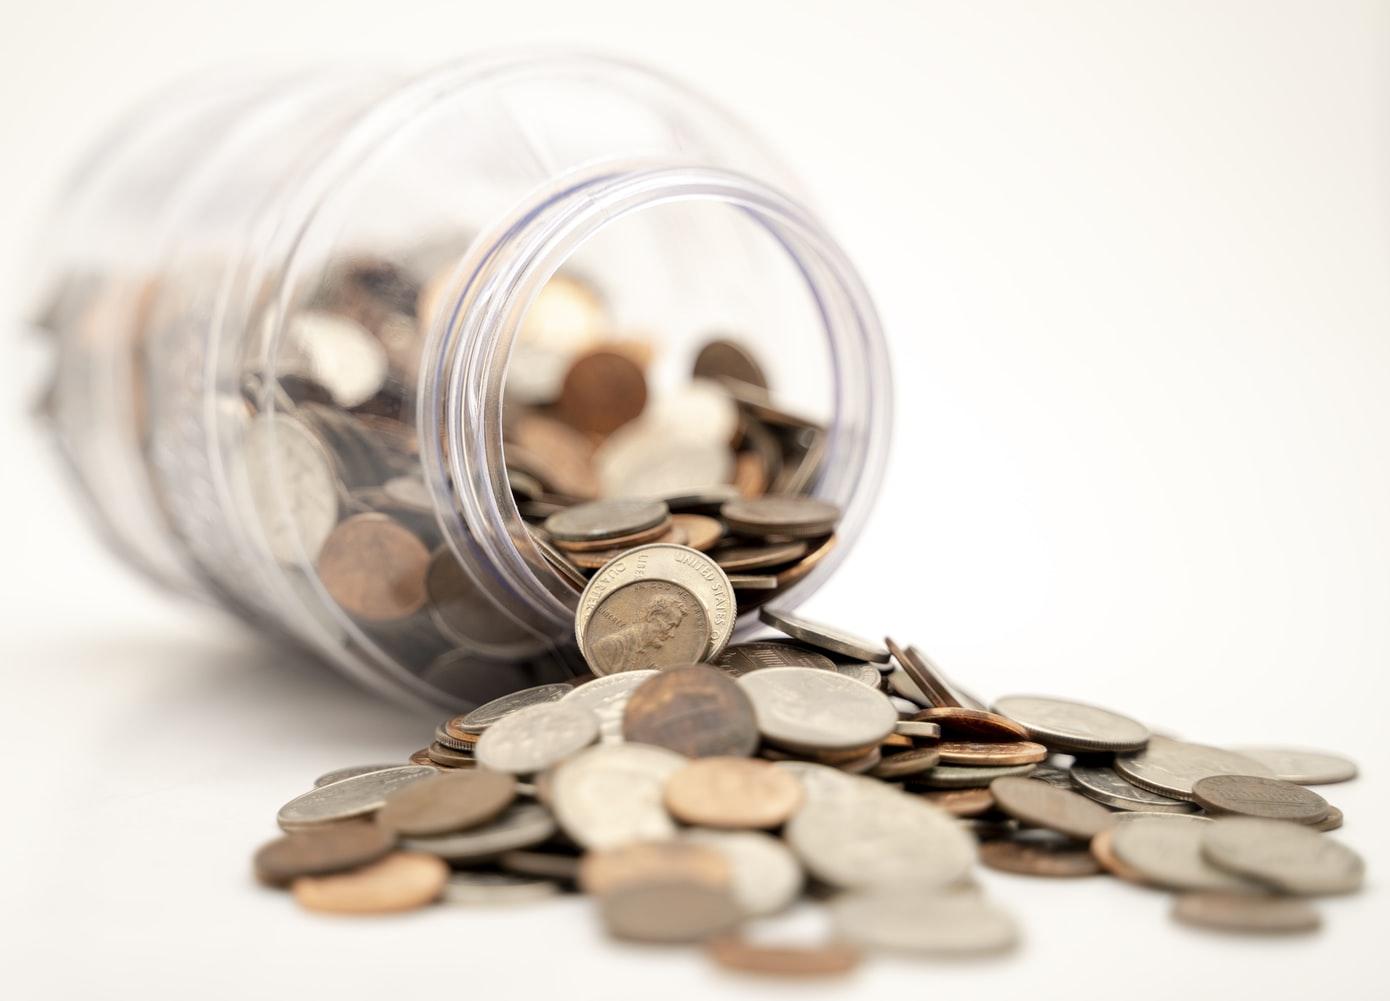 coins, jar